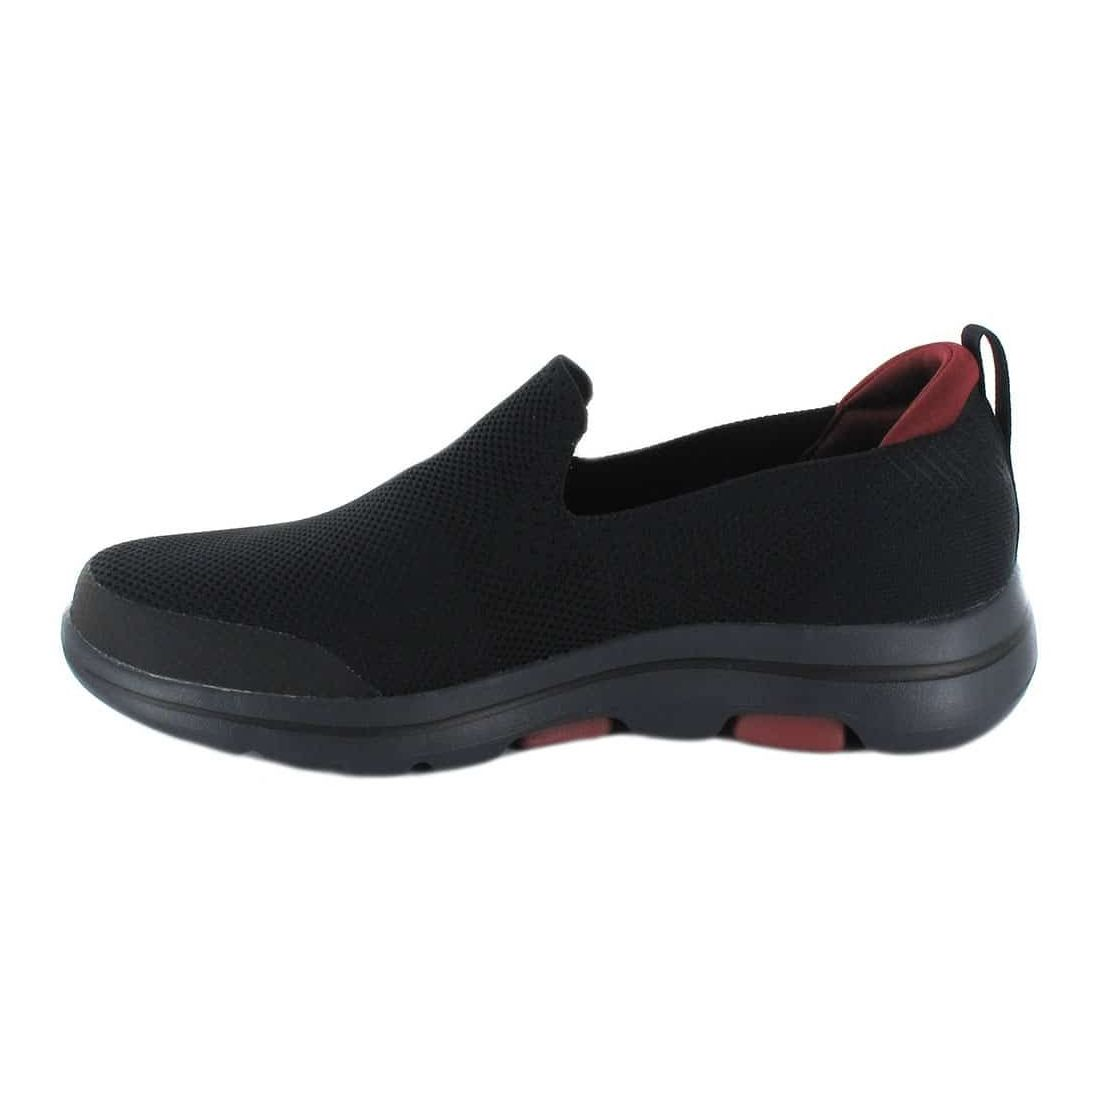 Calzado Casual Hombre - Skechers GOwalk 5 Negro negro Lifestyle